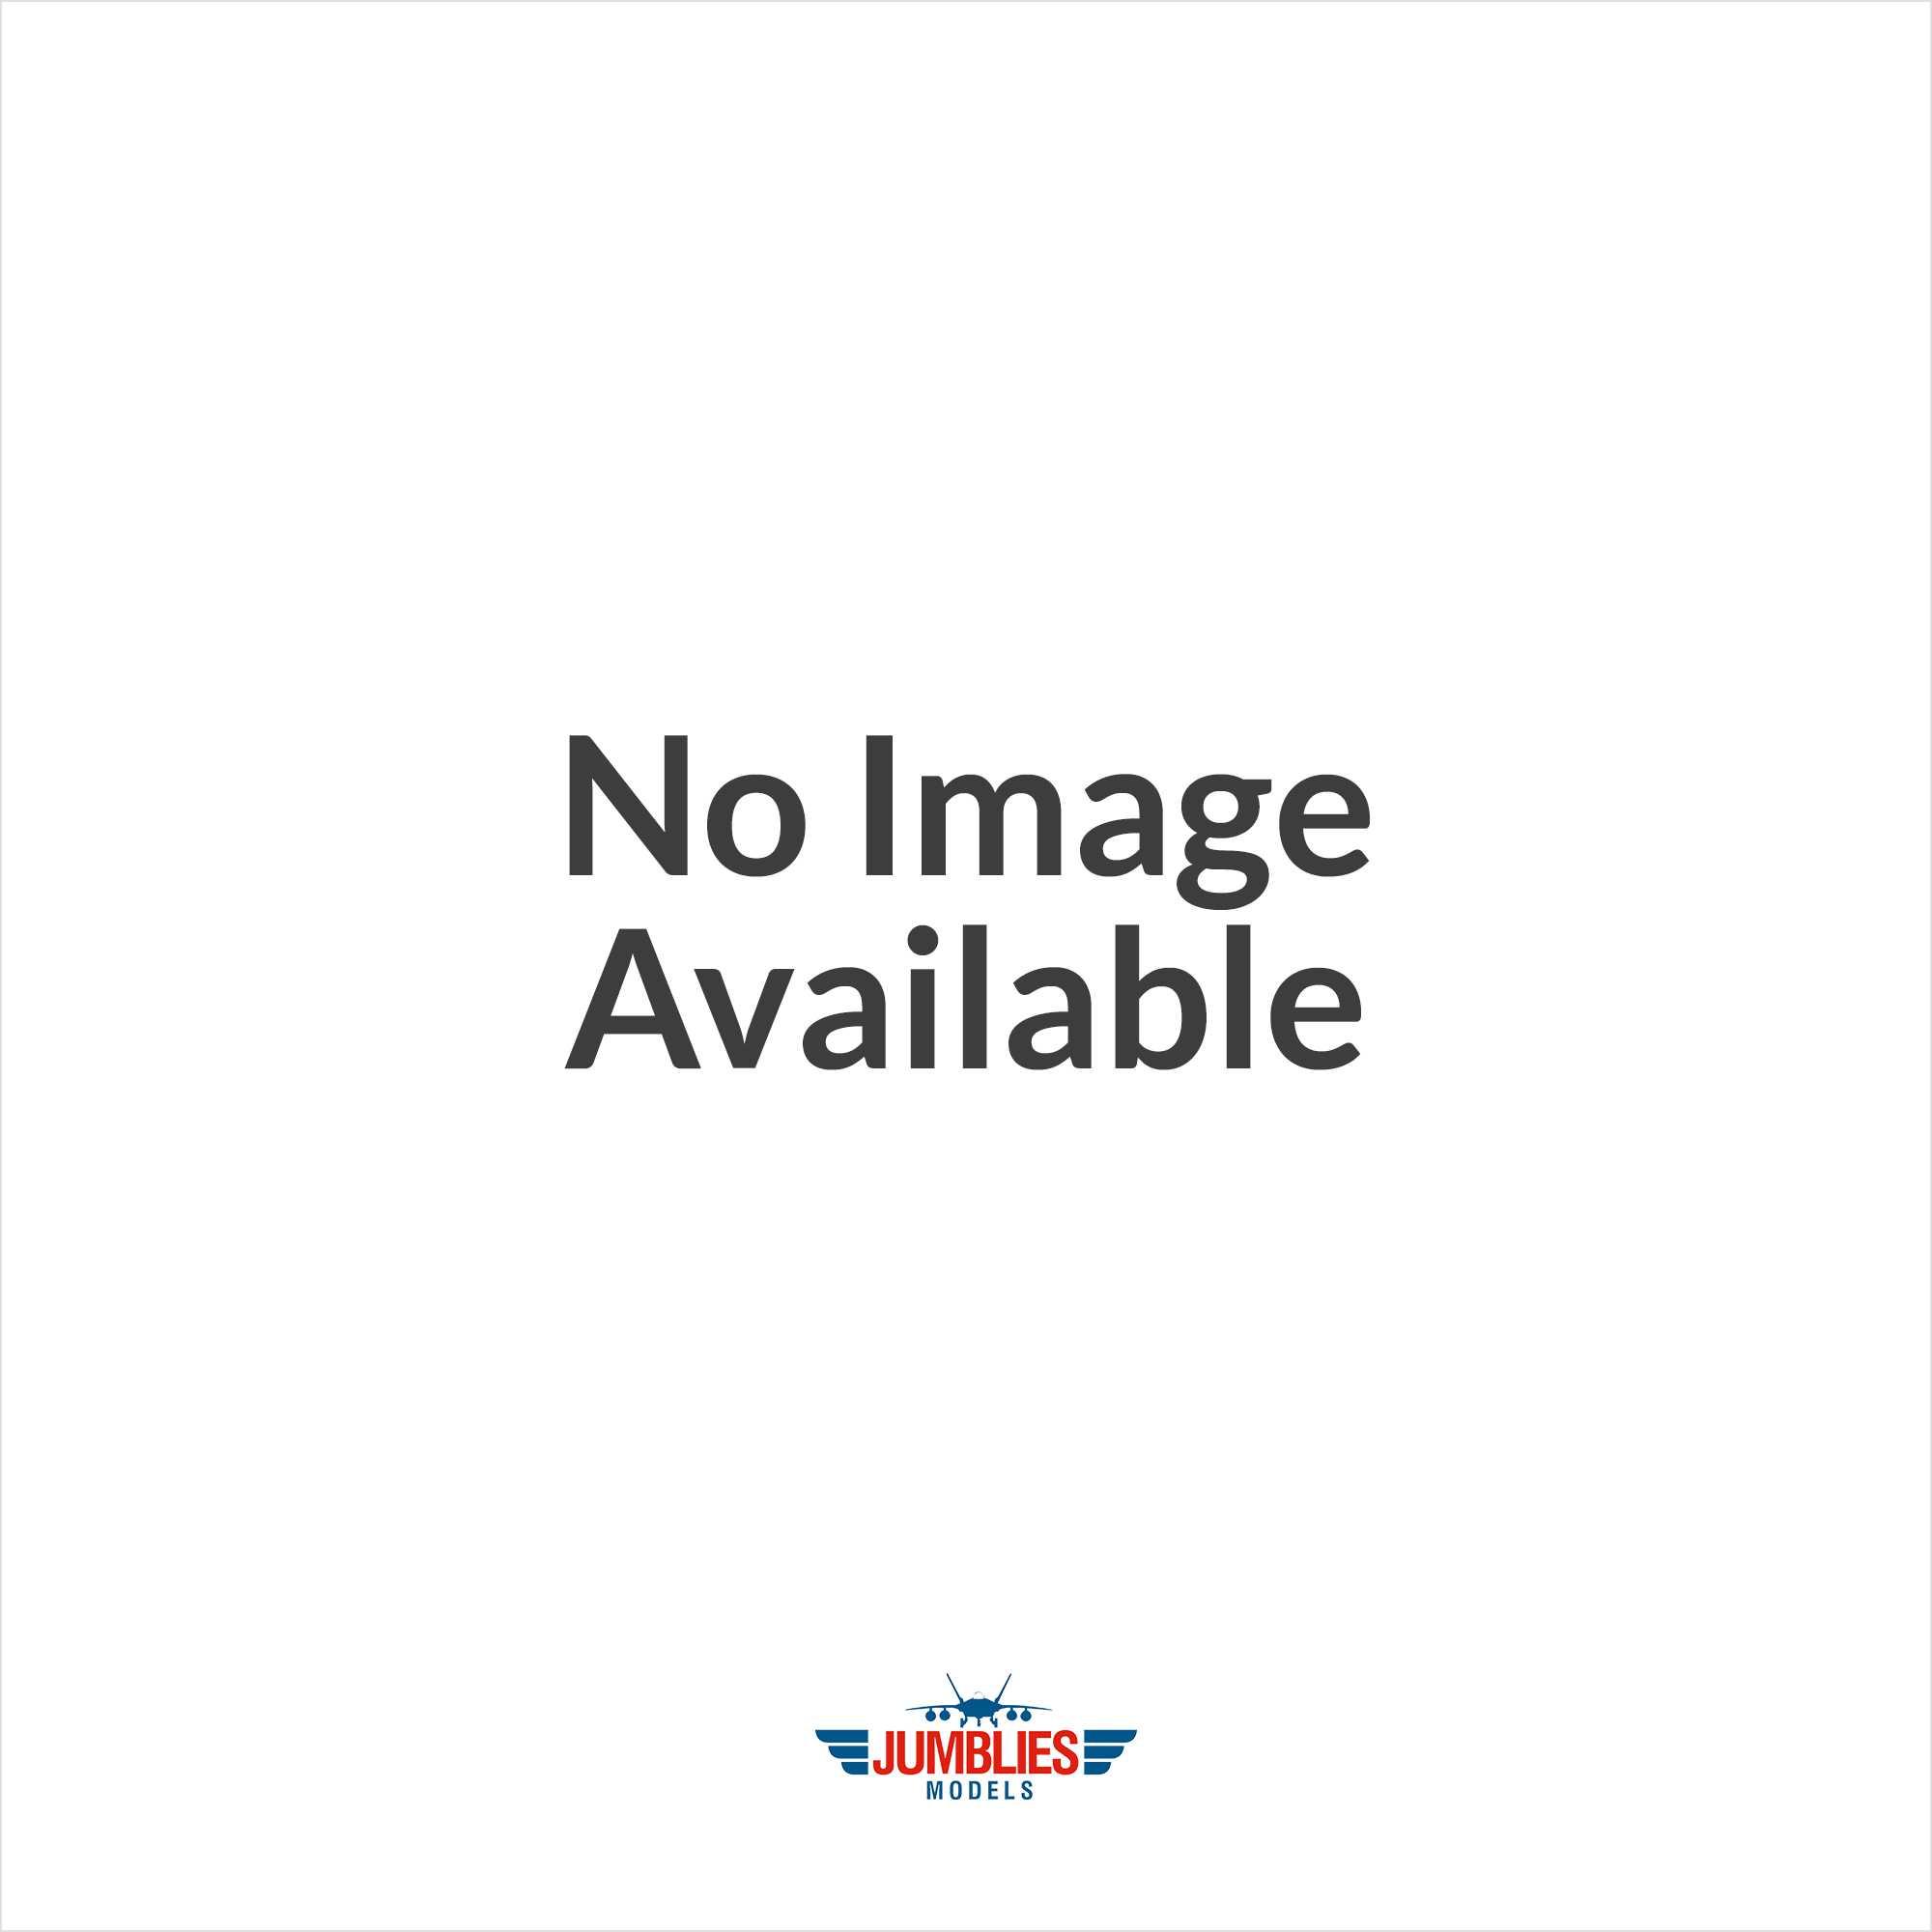 Moebius Models 1:4105 Battlestar Galactica Battlestar Galactica Model Kit